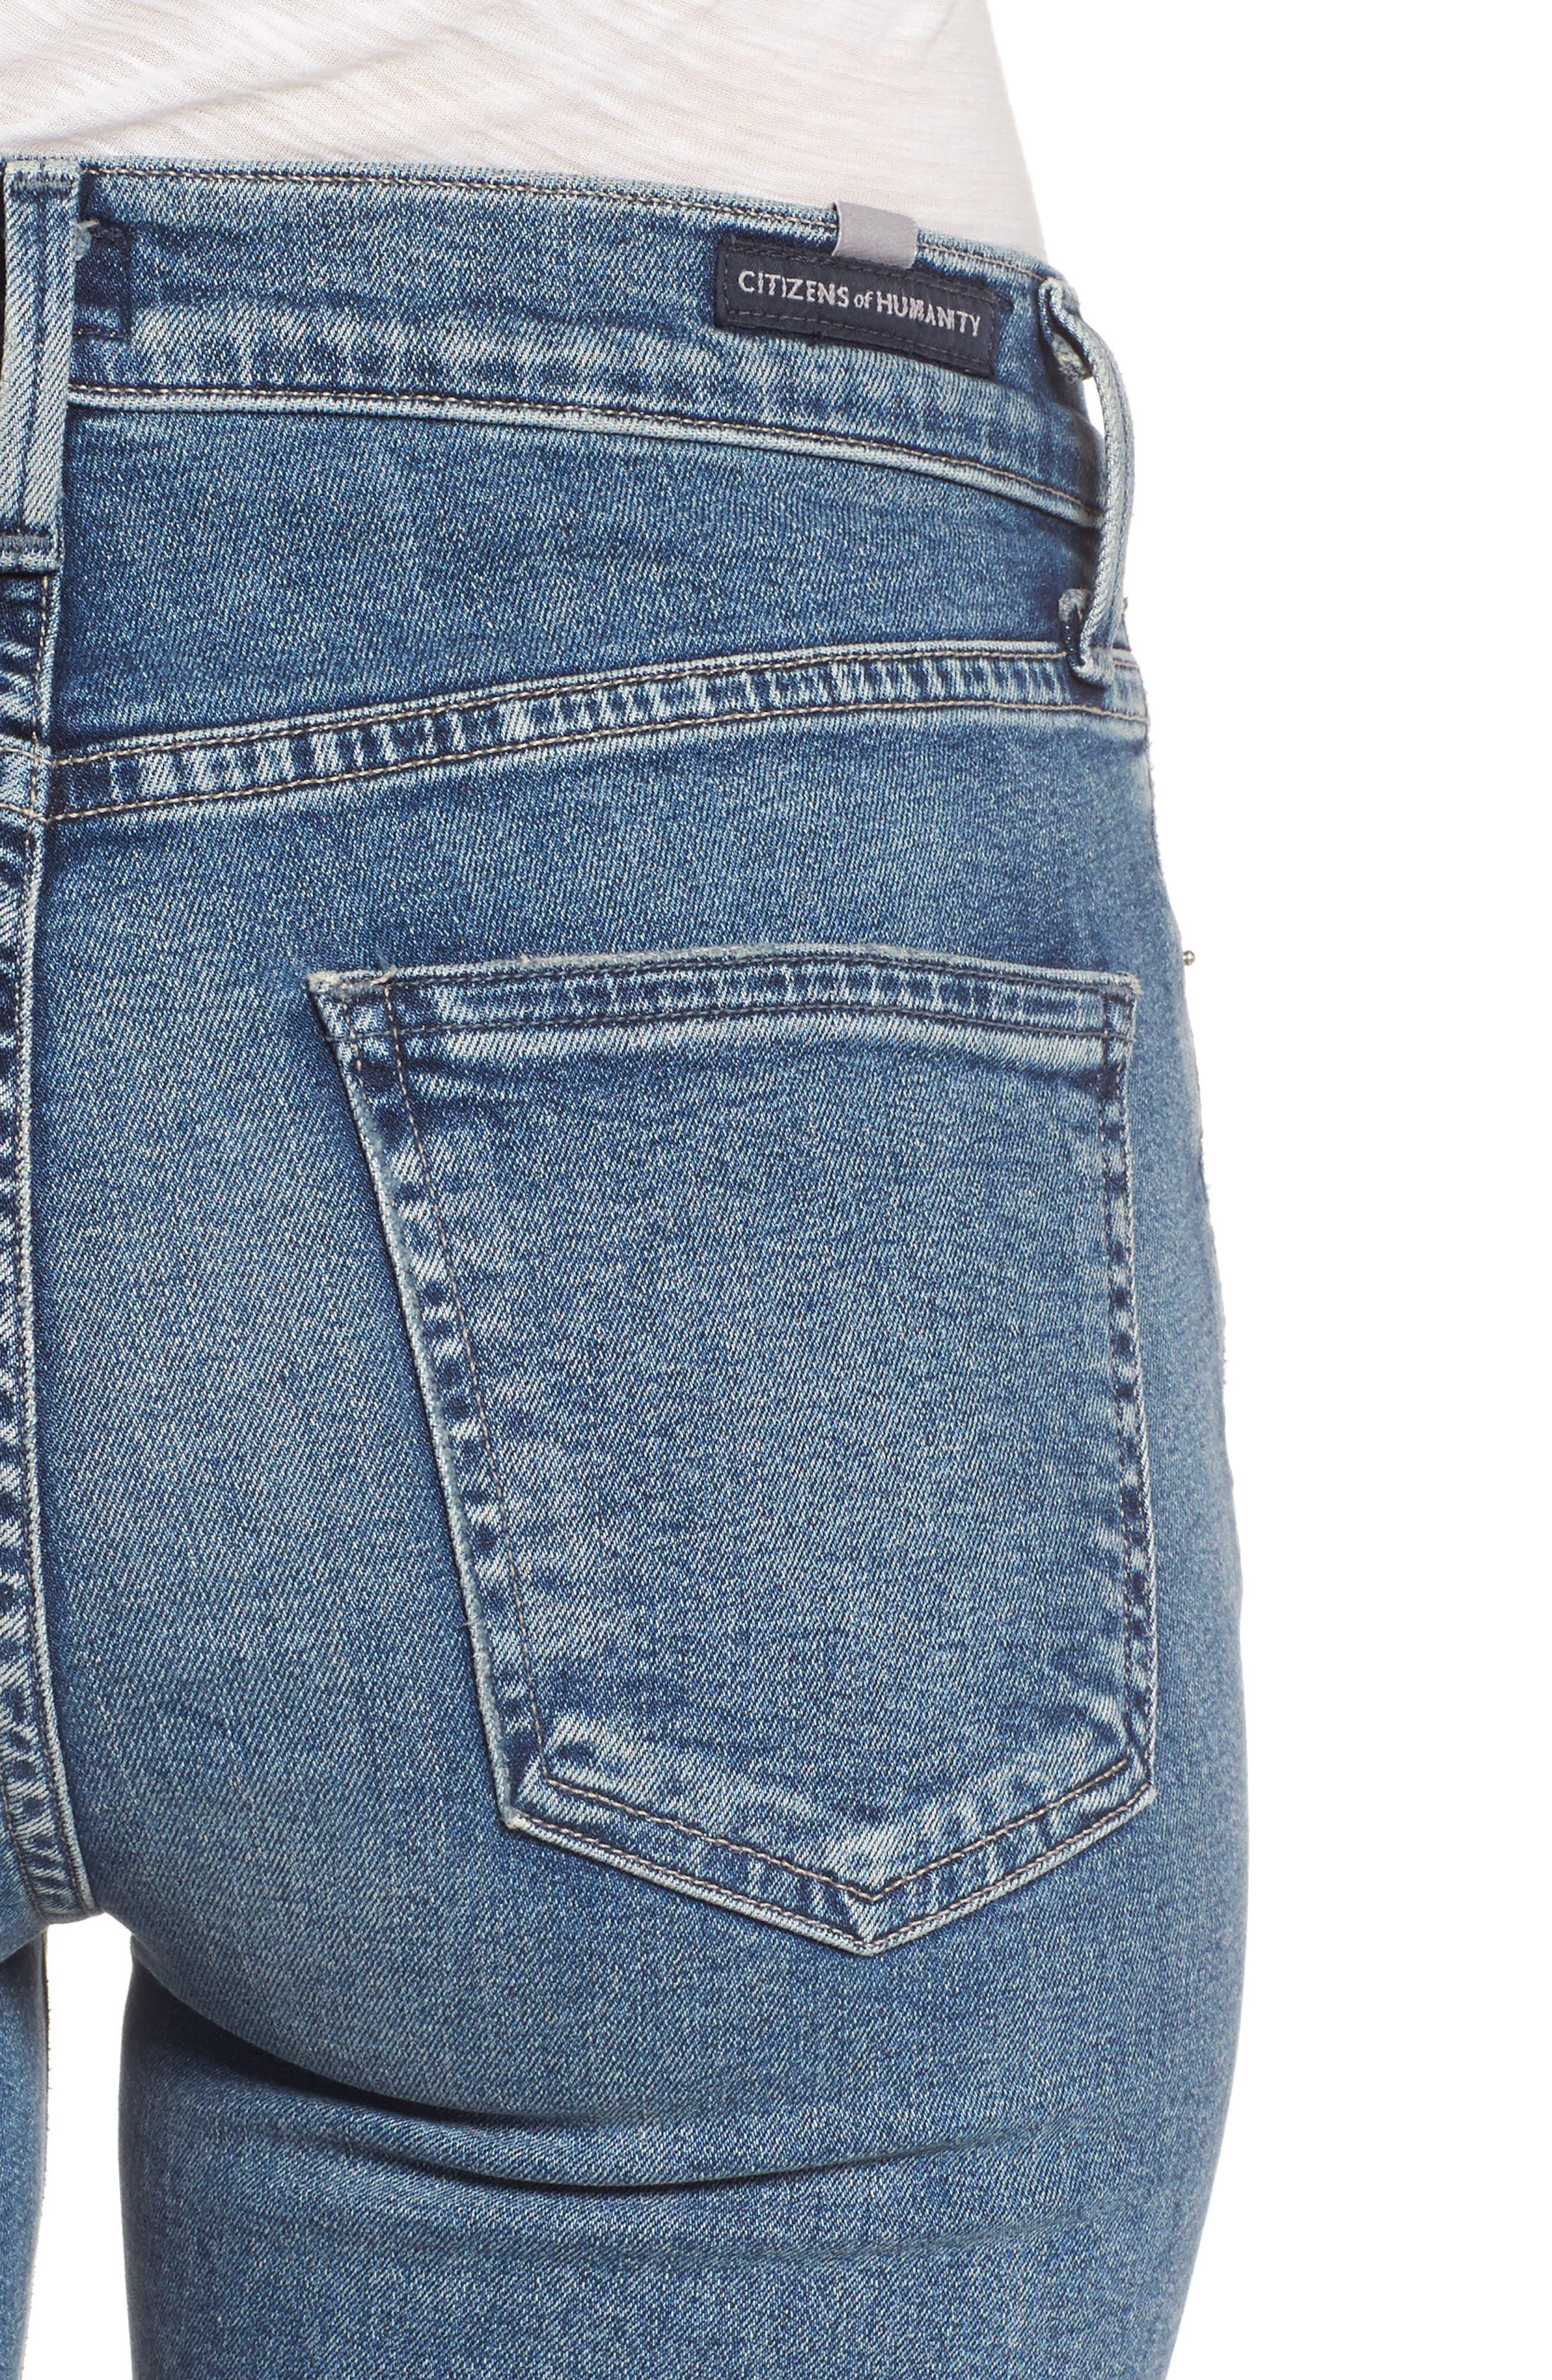 Rocket Crop Skinny Jeans,                             Alternate thumbnail 4, color,                             Orbit